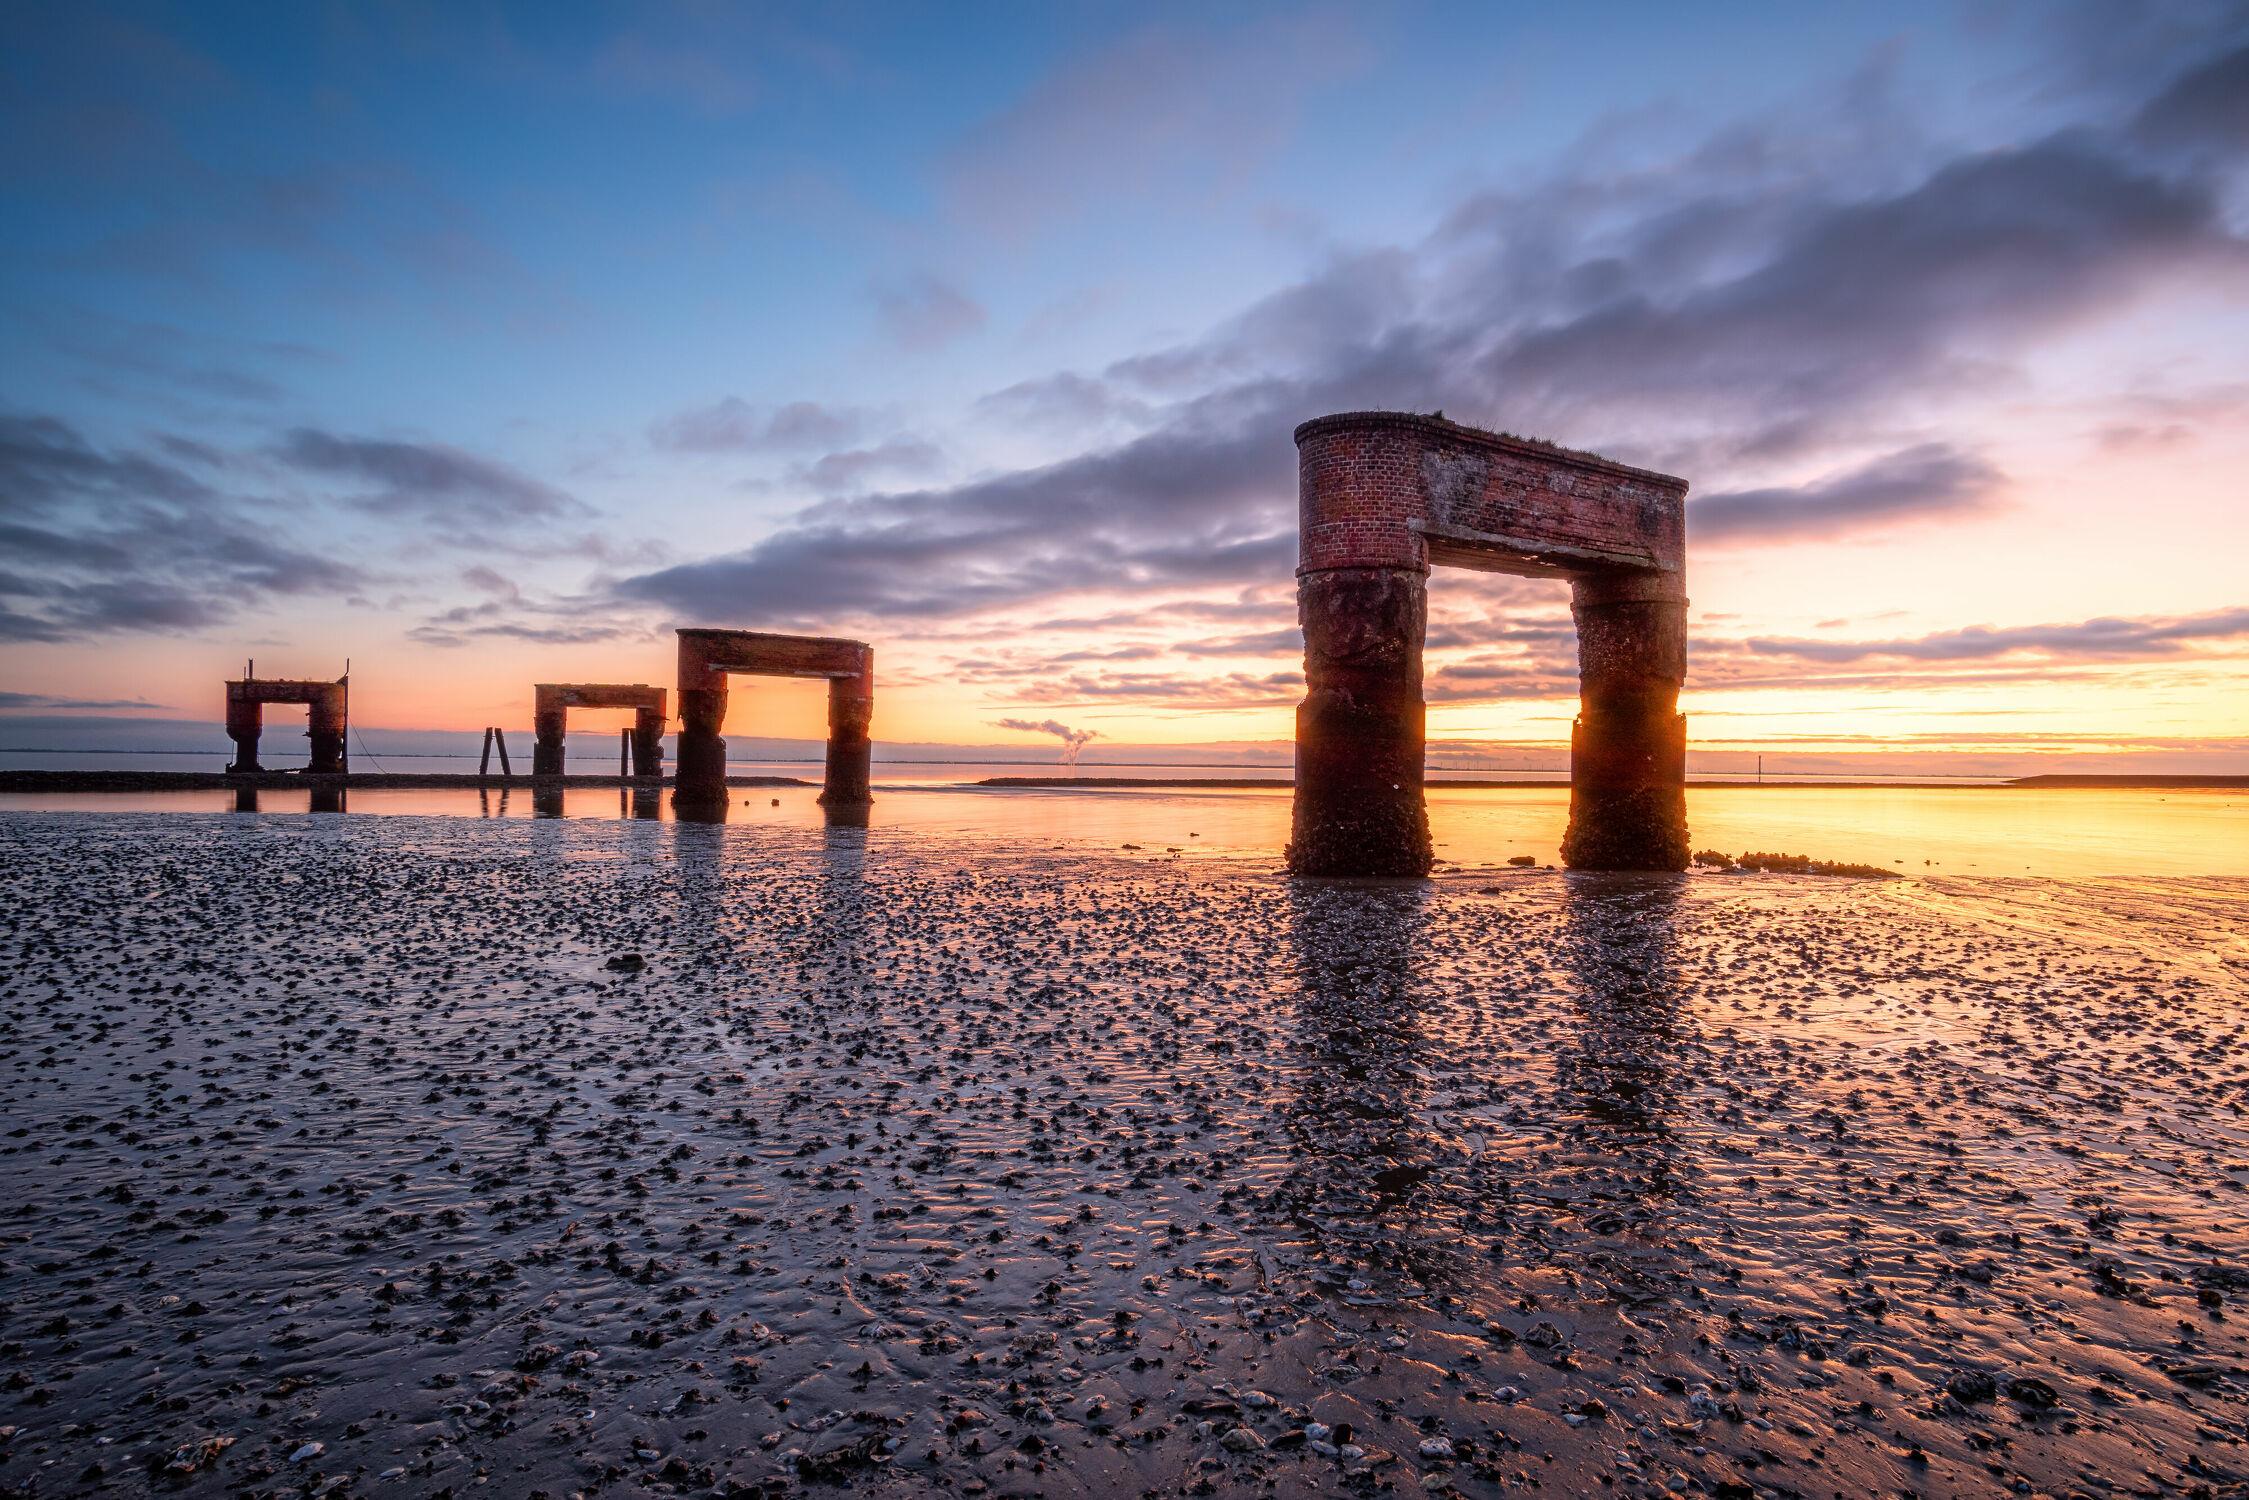 Bild mit Sonnenuntergang, Sonnenuntergang, Bauwerke, Meer, Nordsee, Küste, Historisch, Ostfriesland, Ebbe, Fähranleger